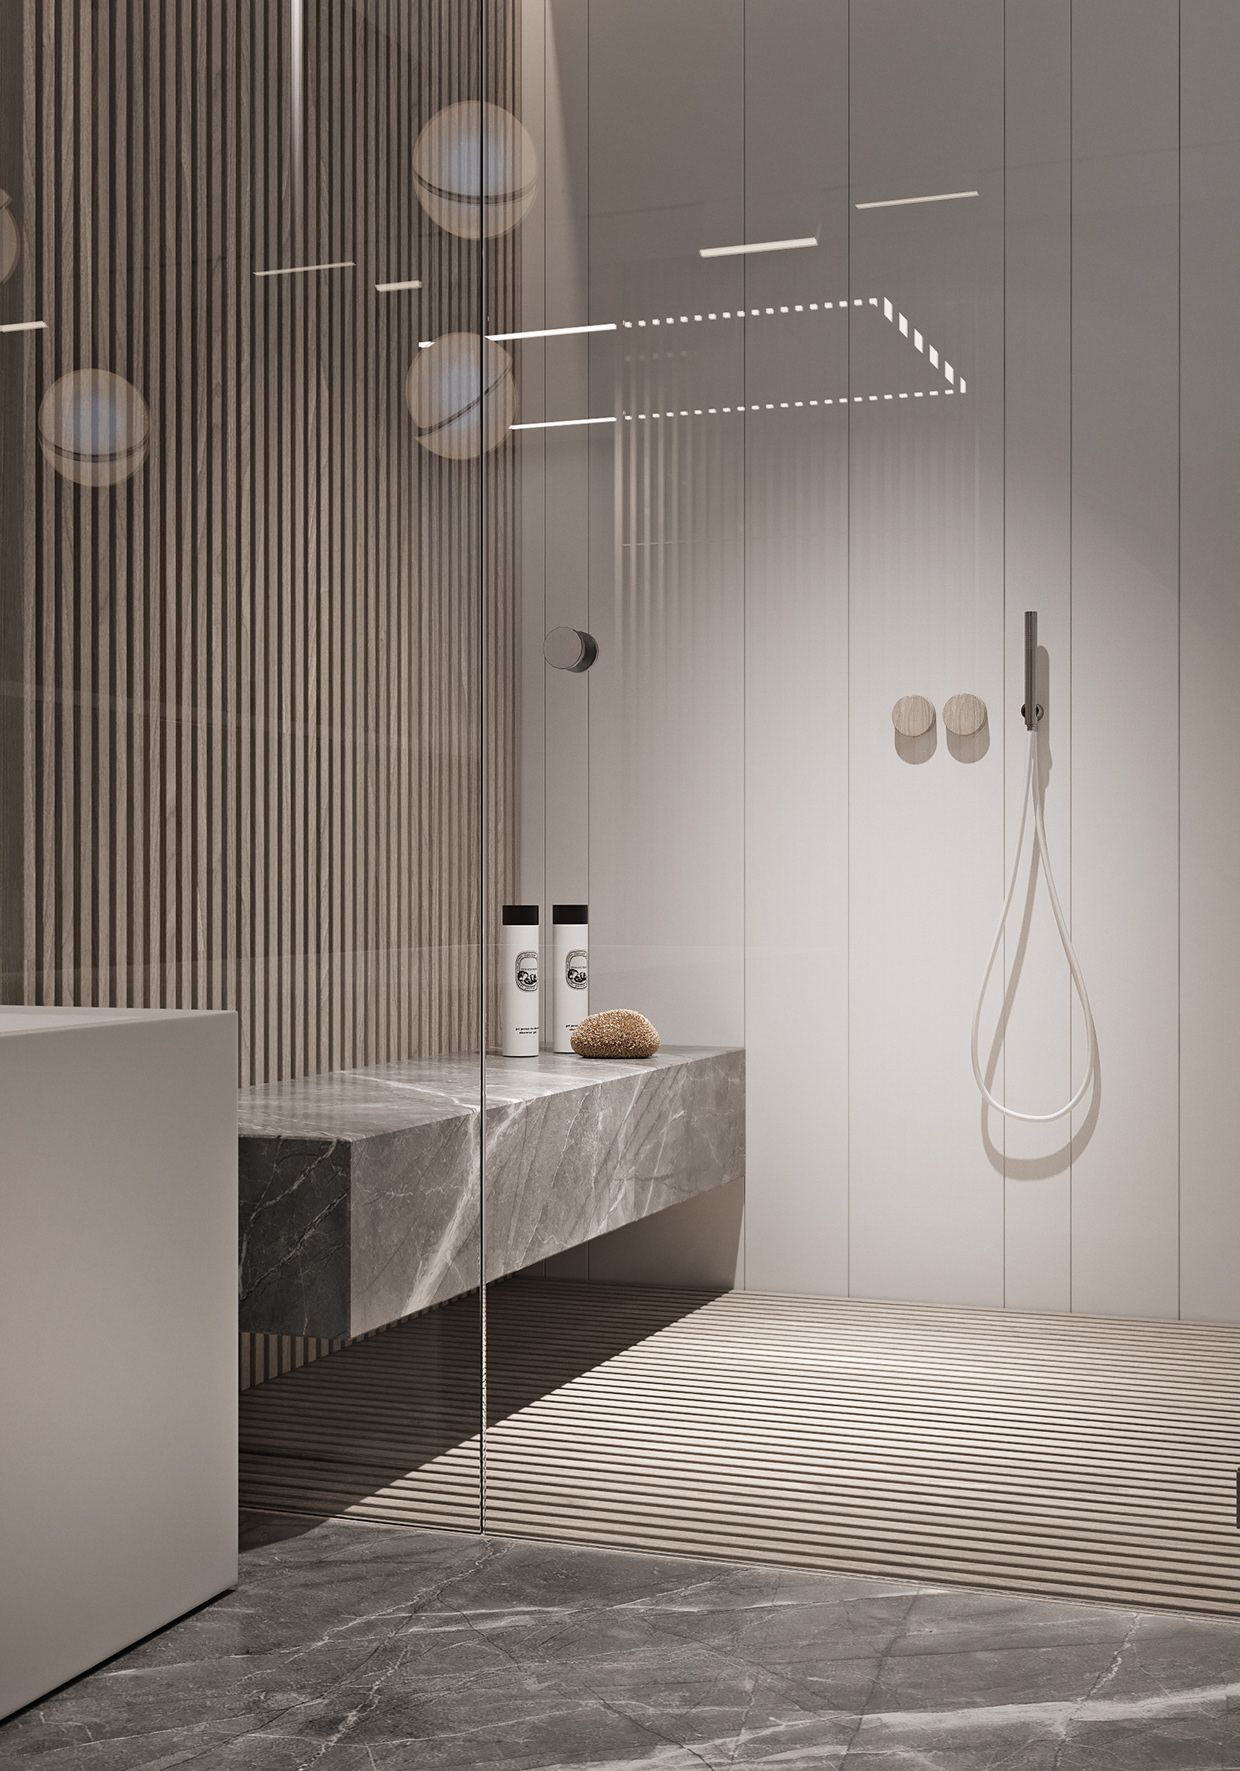 Remodeling Bathroom Ideas From Standard To Modern To Beach Inspired Bathroom Desi Luxury Bathroom Master Baths Luxury Master Bathrooms Modern Bathroom Design